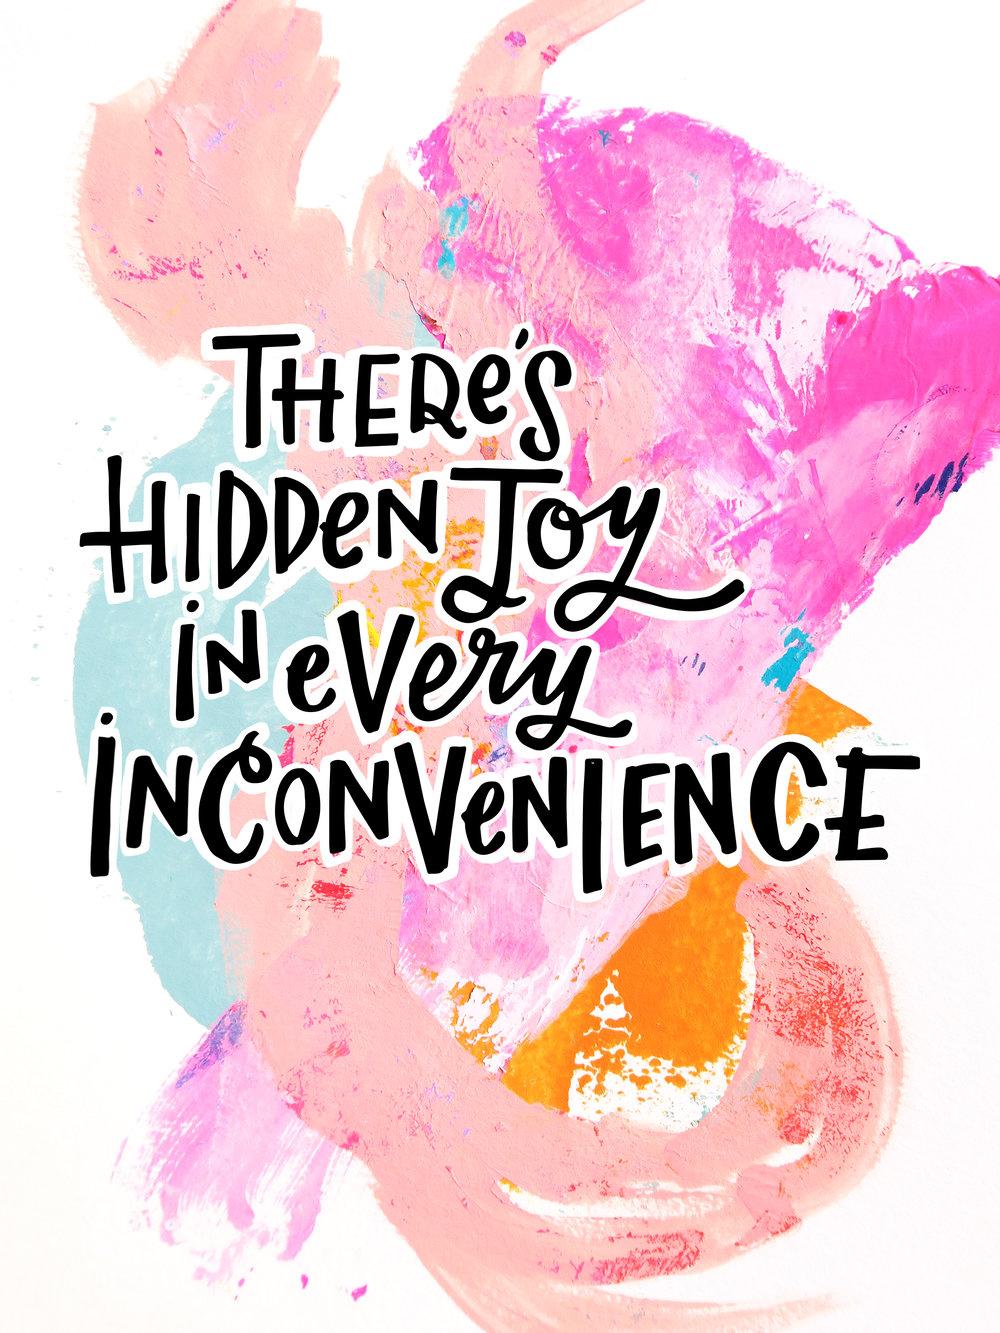 8/1/16: Inconvenience